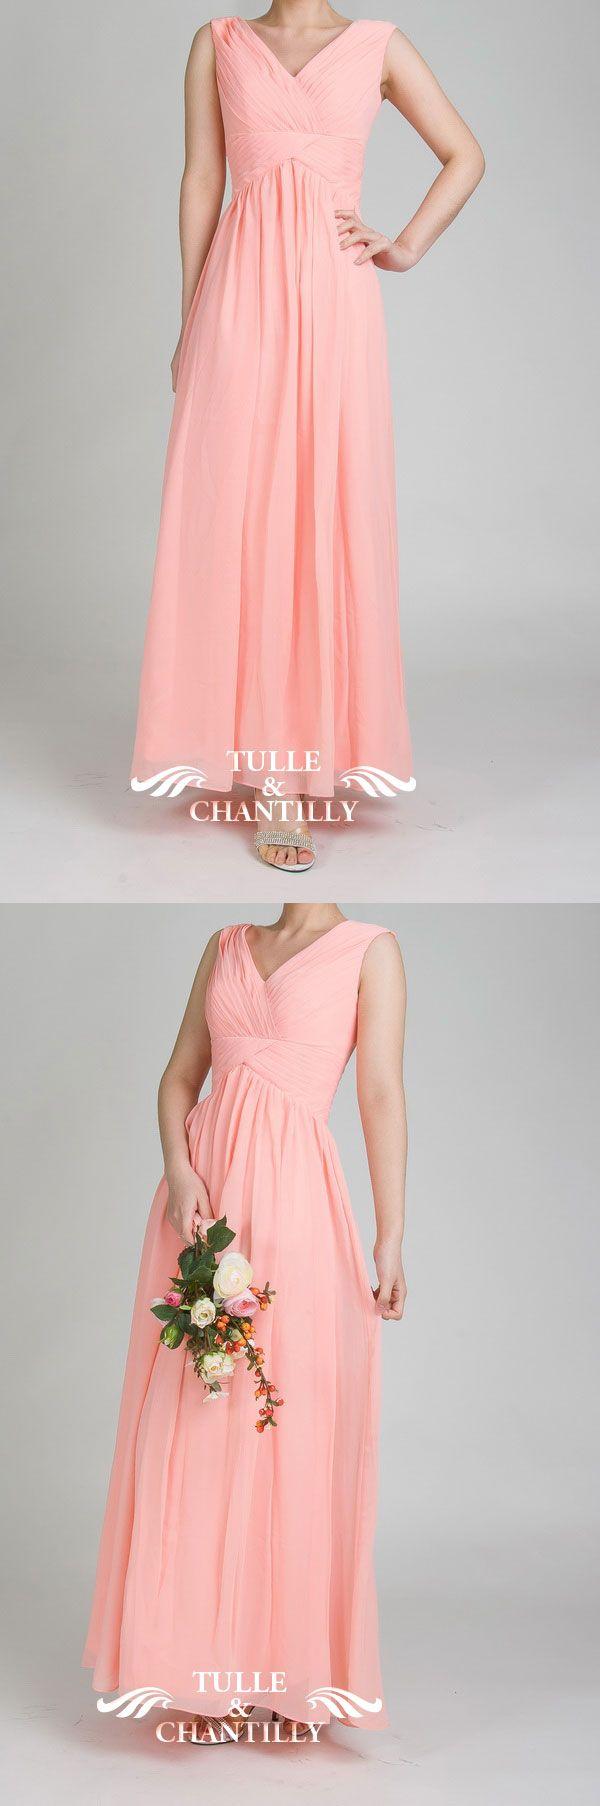 long v-neck simmon pink bridesmaid dress and wedding colors ideas 2015